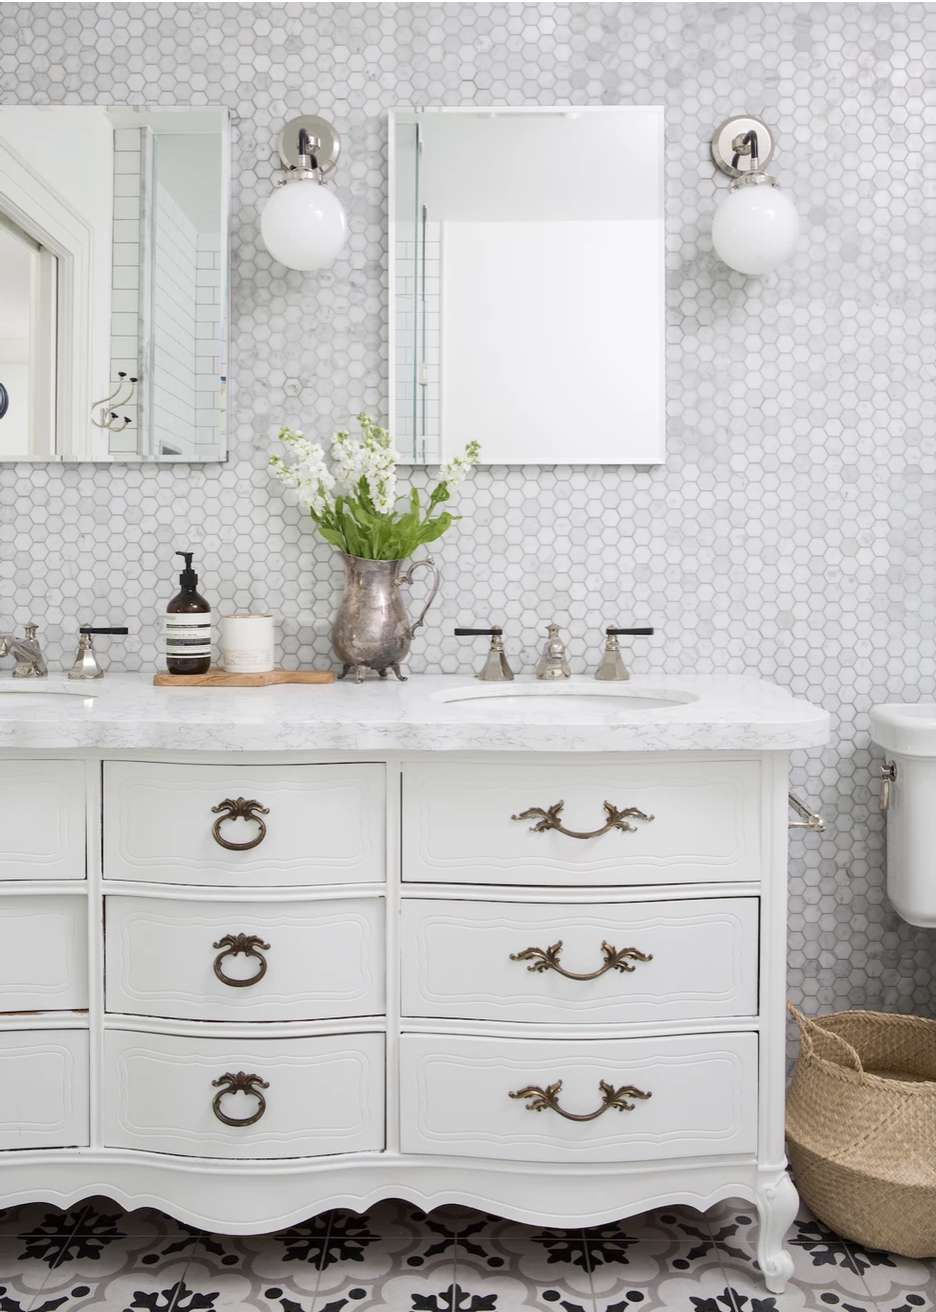 large vintage dresser turned into DIY bathroom vanity